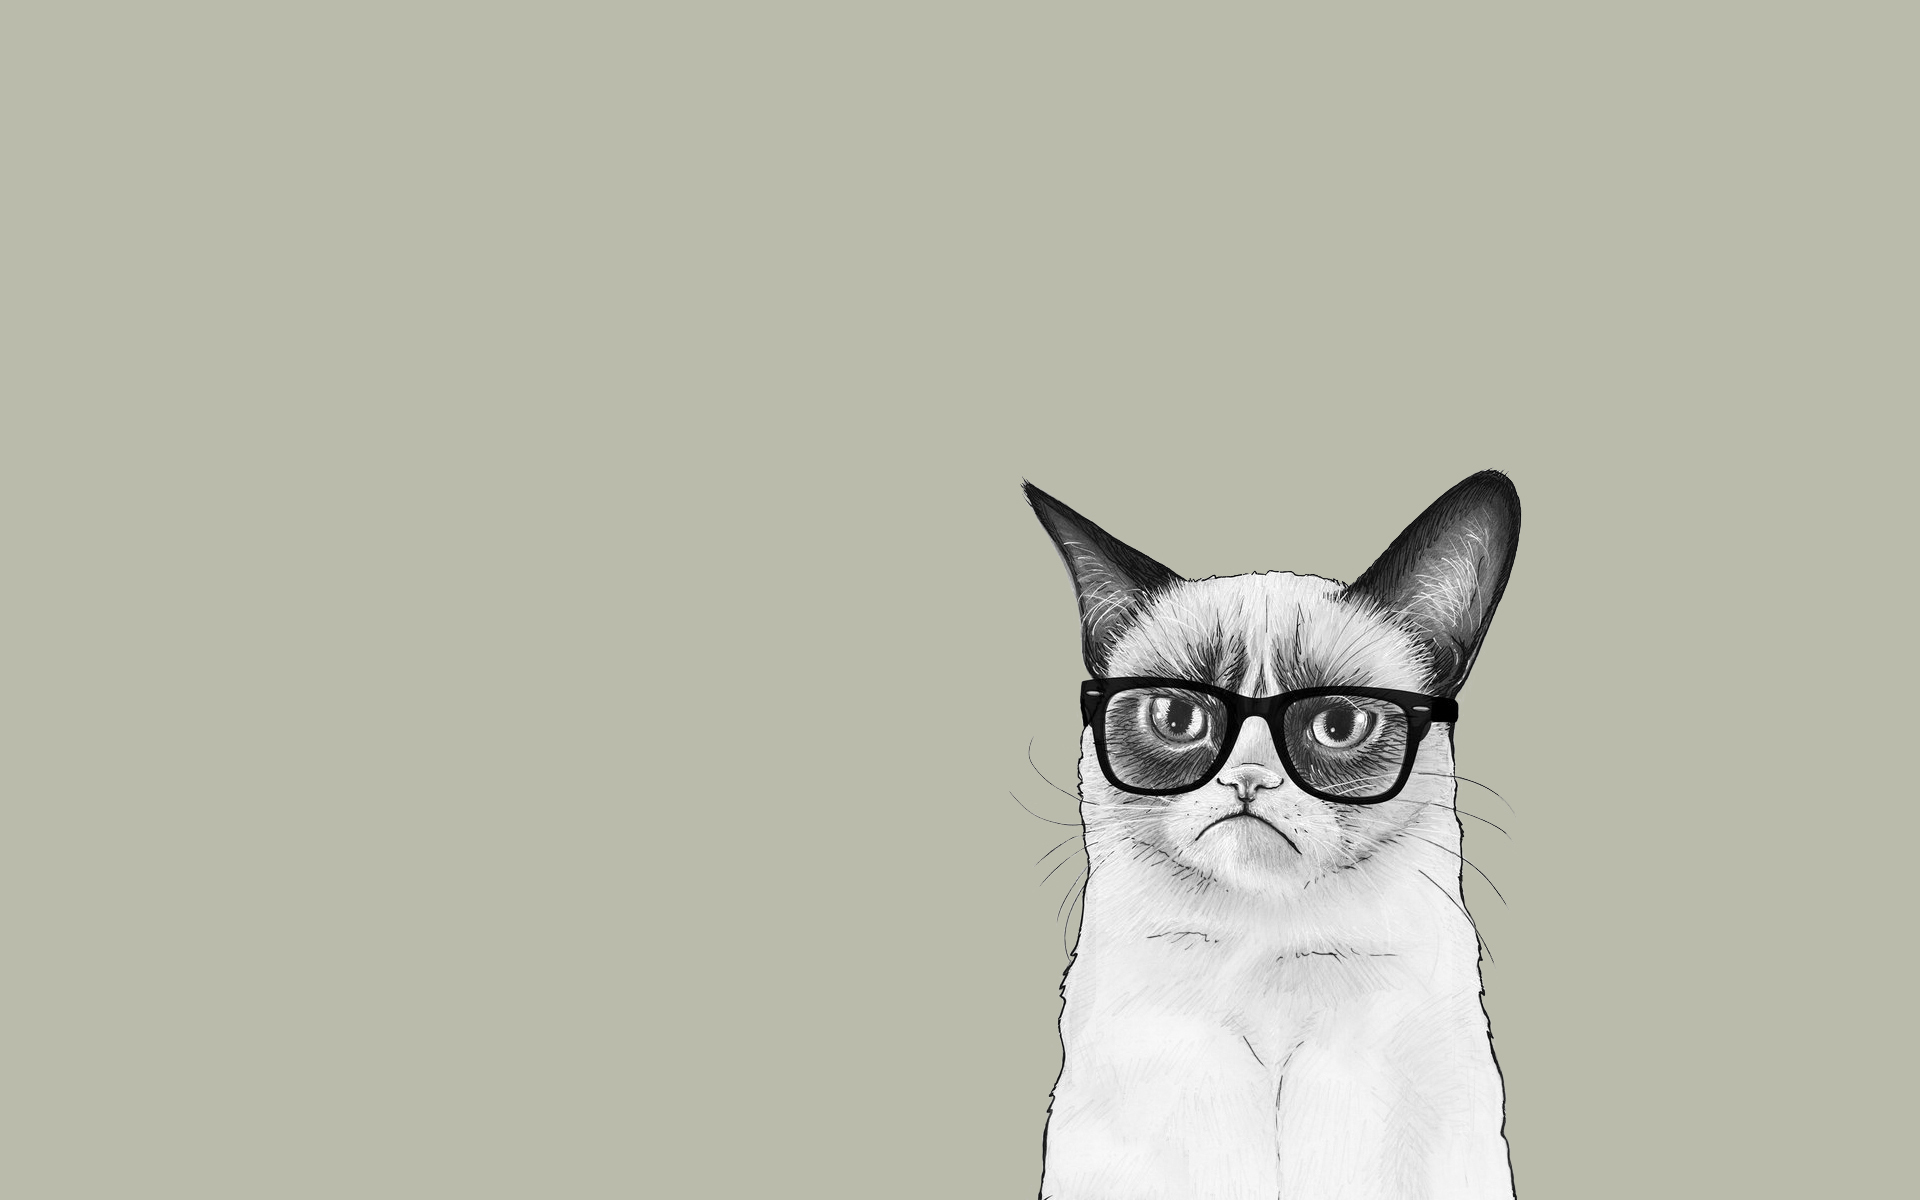 Halloween Black Cat Wallpaper Free Minimal Hd Wallpapers Pixelstalk Net